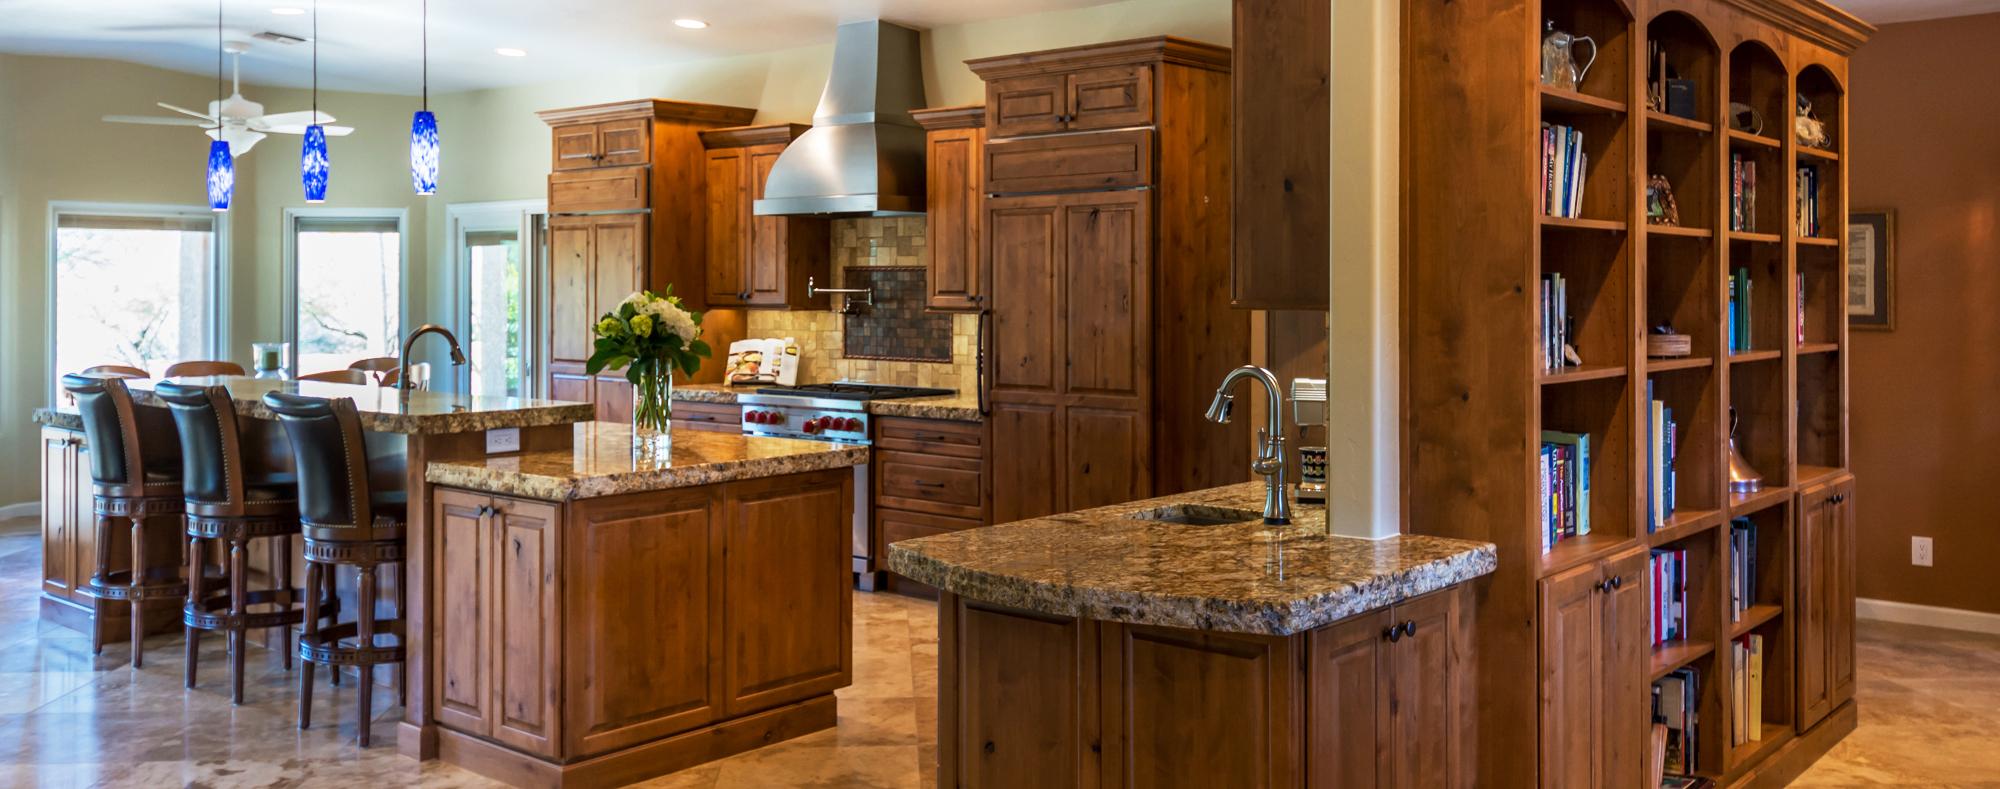 canyoncabinetry kitchen remodeling tucson az